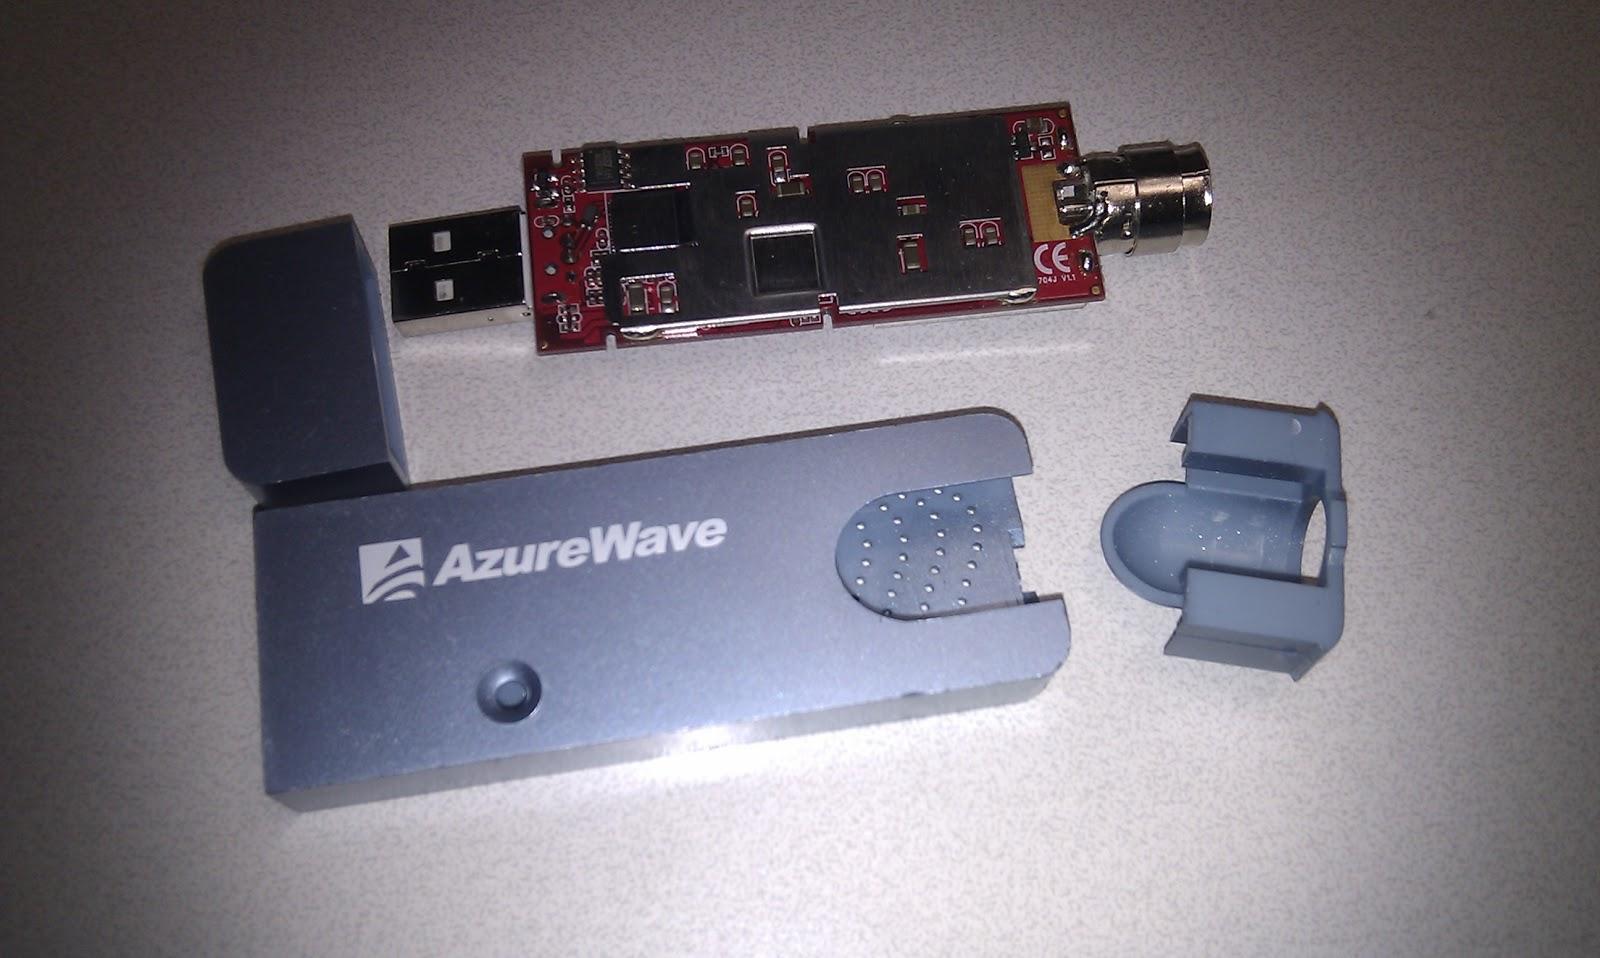 Anttis Linuxtv Blog October 2012 Tda9887 Ifpll Demodulator Circuit With Fm Radio Pictures